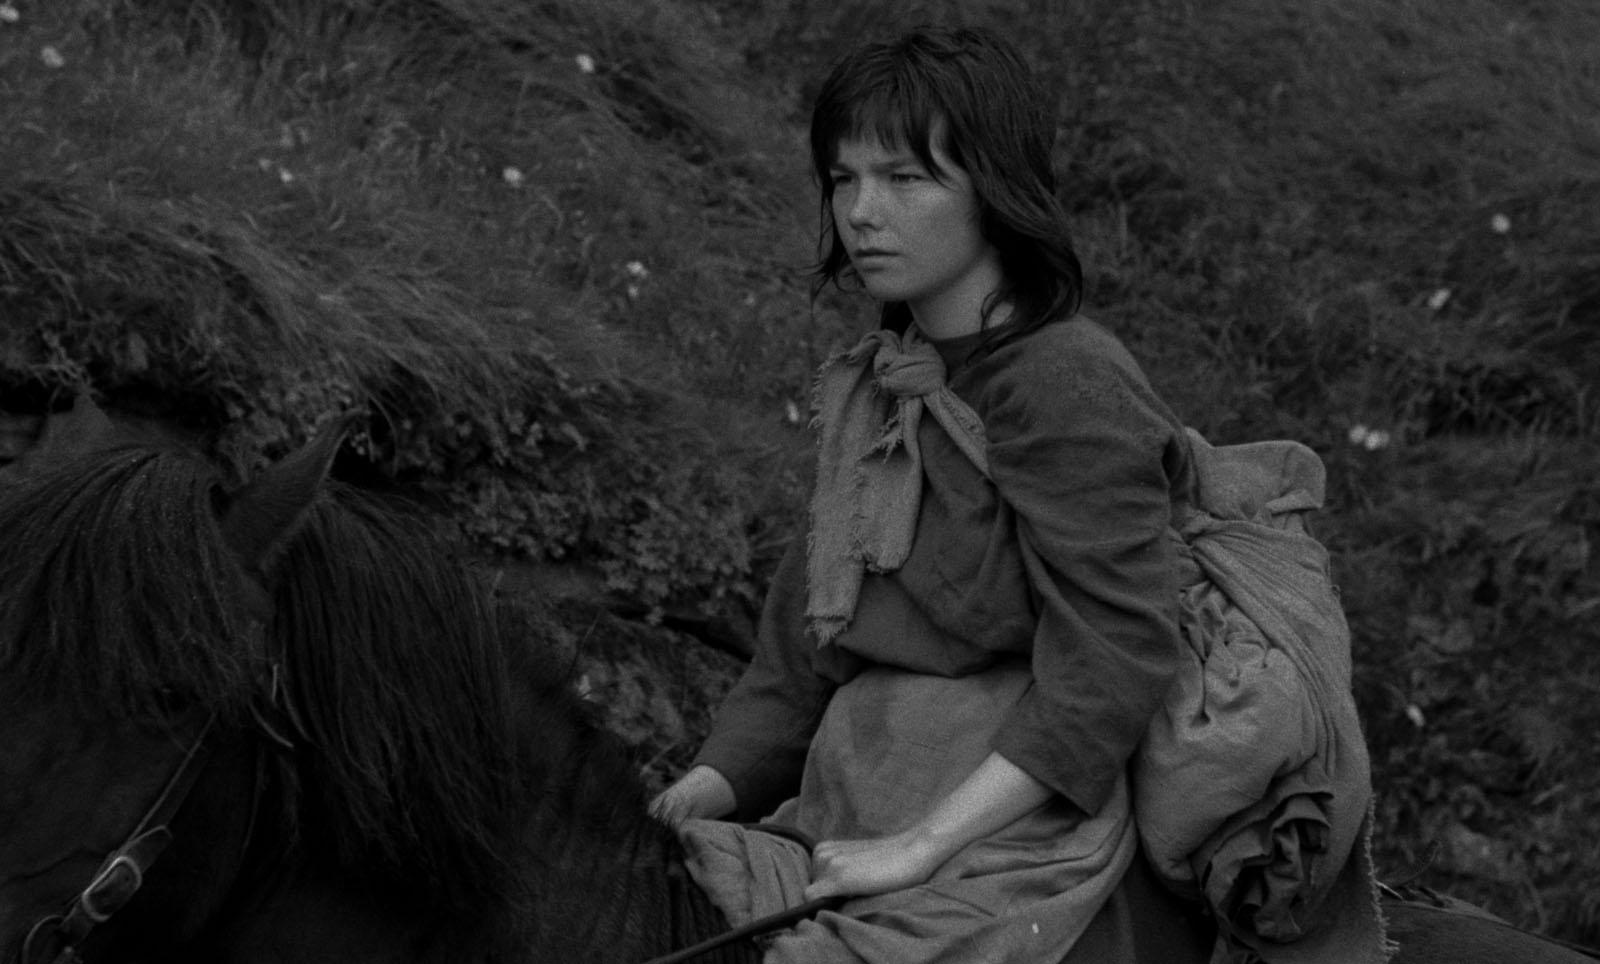 Björk Guðmundsdóttir as Margit in The Juniper Tree (1990)